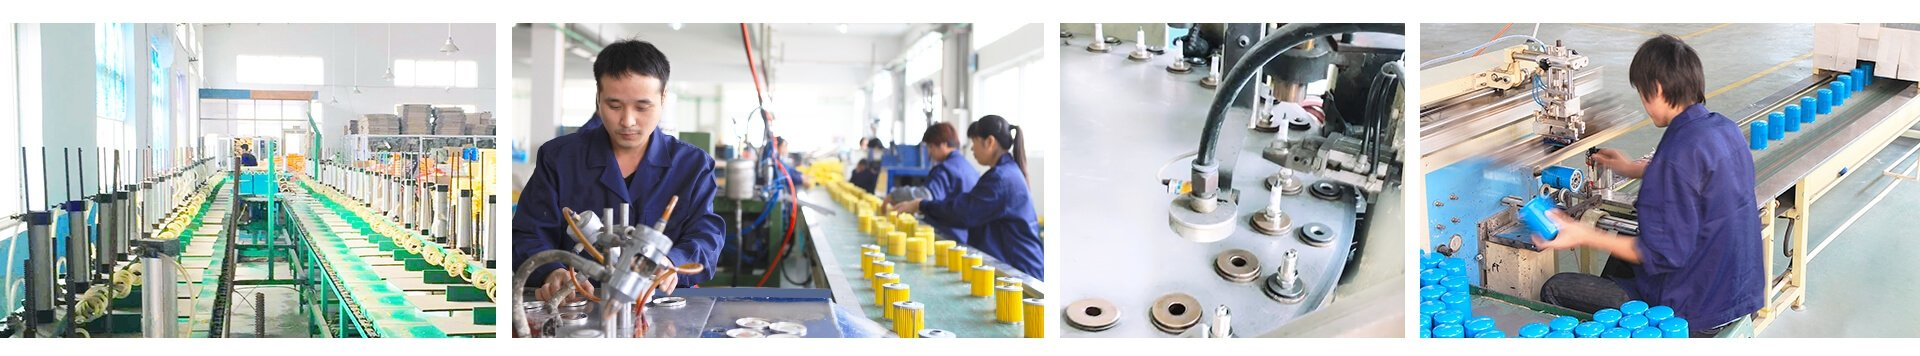 dcpart car filters production